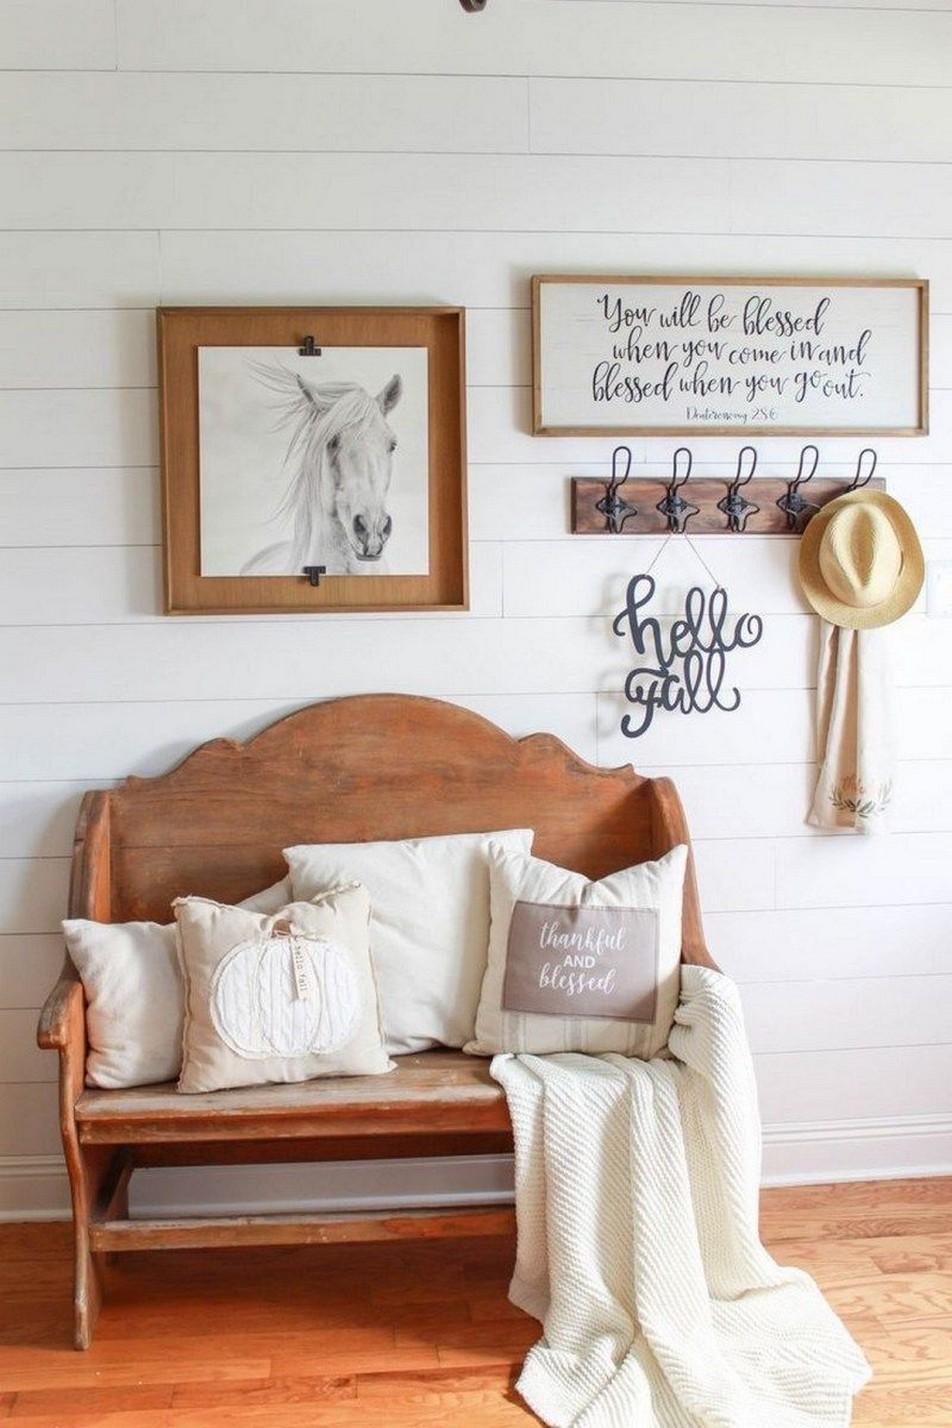 61 Farmhouse Style Steel Sheds Home Decor 35